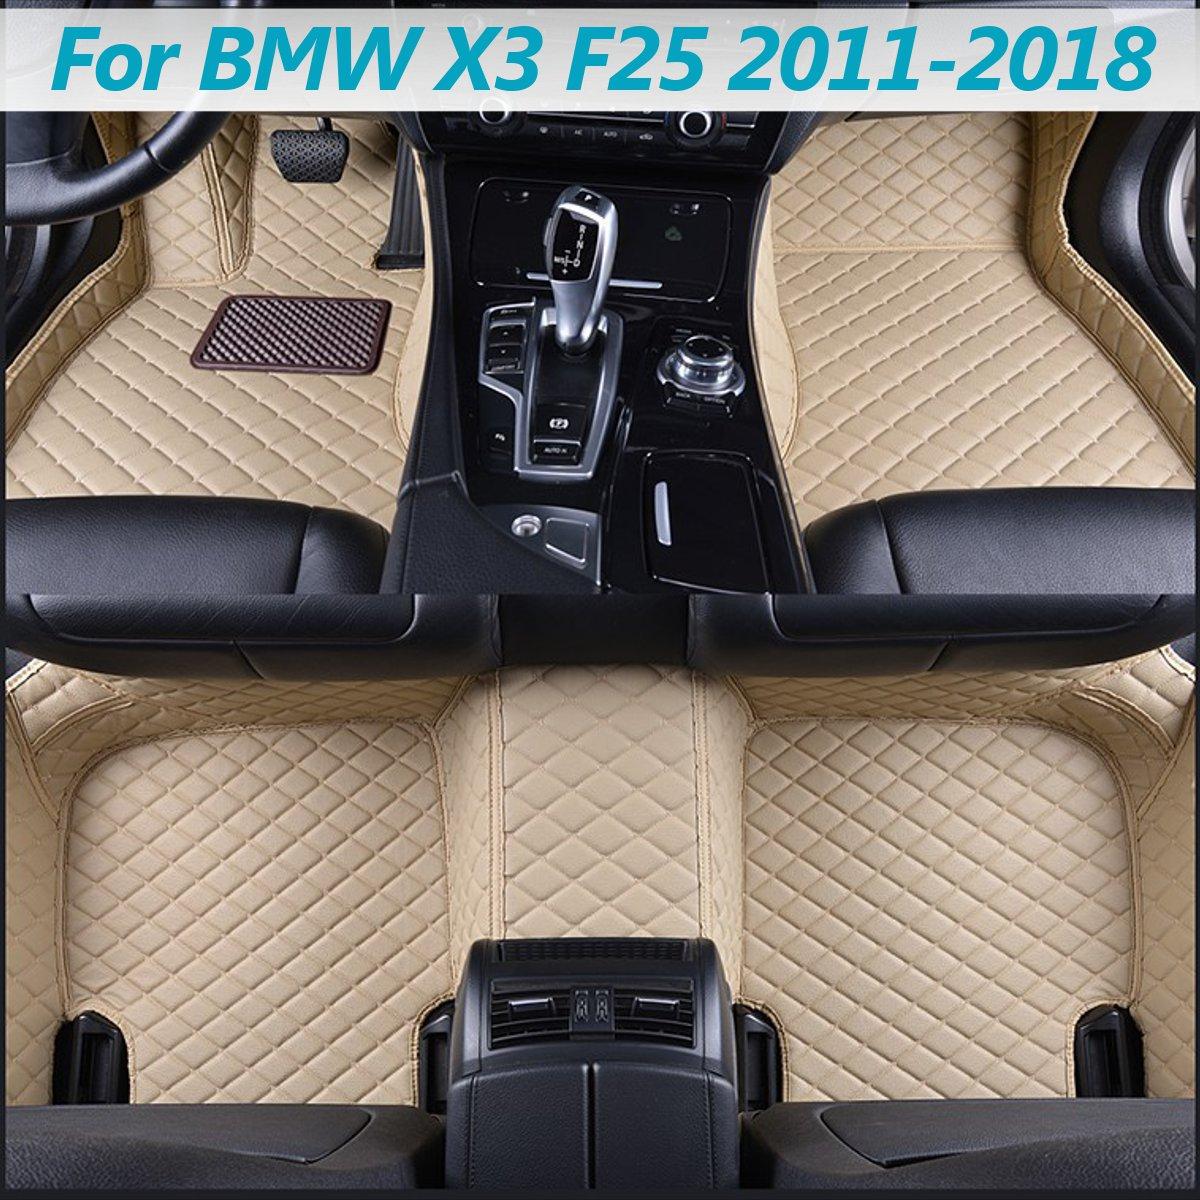 1set Car Leather Front Rear Floor Mats Set For BMW X3 F25 2011 2012 2013 2014 2015 2016 2017 2018 Liner Waterproof 5 Seat Mat1set Car Leather Front Rear Floor Mats Set For BMW X3 F25 2011 2012 2013 2014 2015 2016 2017 2018 Liner Waterproof 5 Seat Mat